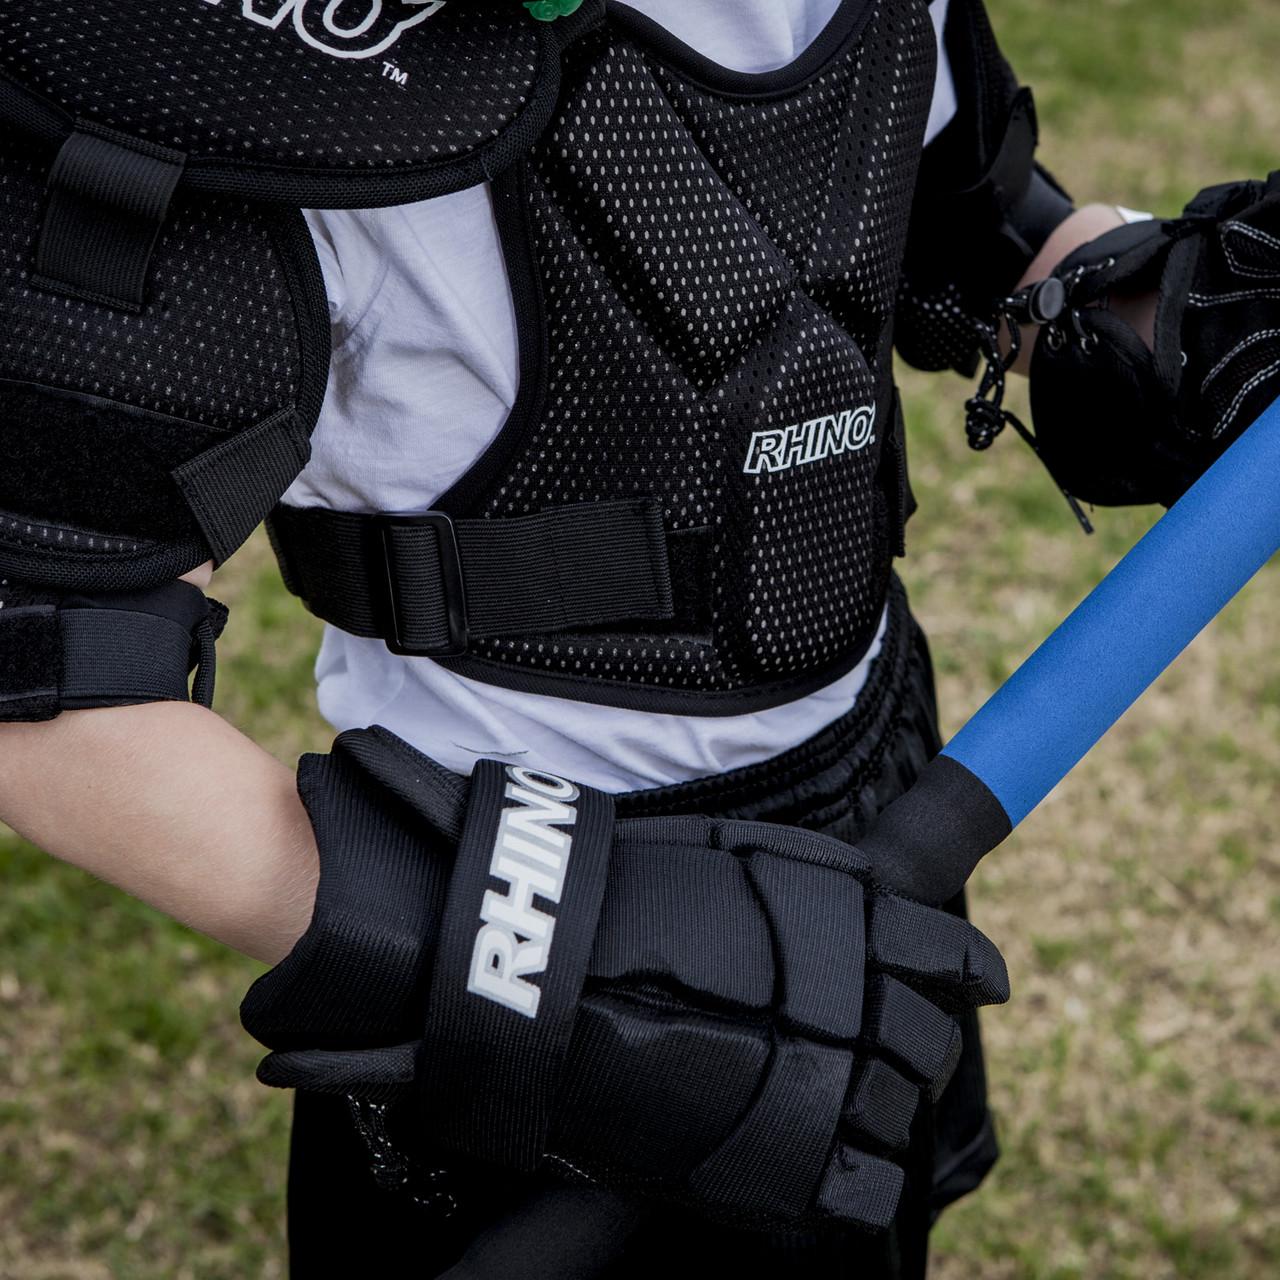 Rhino Lacrosse Youth Combo Set - Athletic Stuff